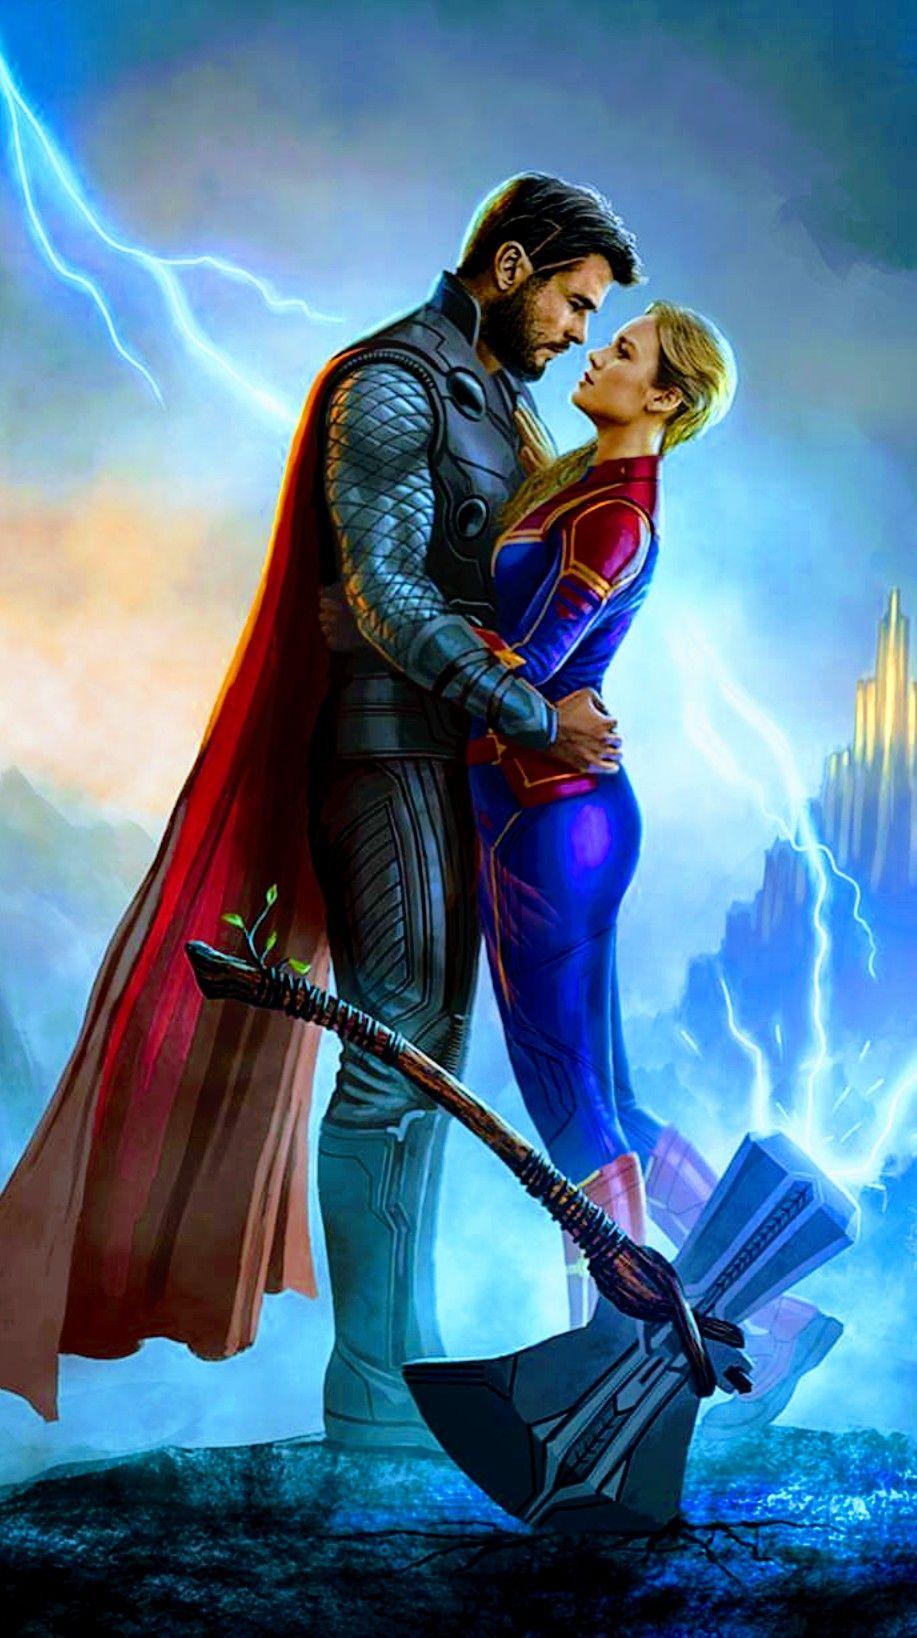 Captain Marvel Thor Avengers End Game Marvel Photo Marvel Superheroes Marvel Superhero Posters Trends for thor and captain marvel love